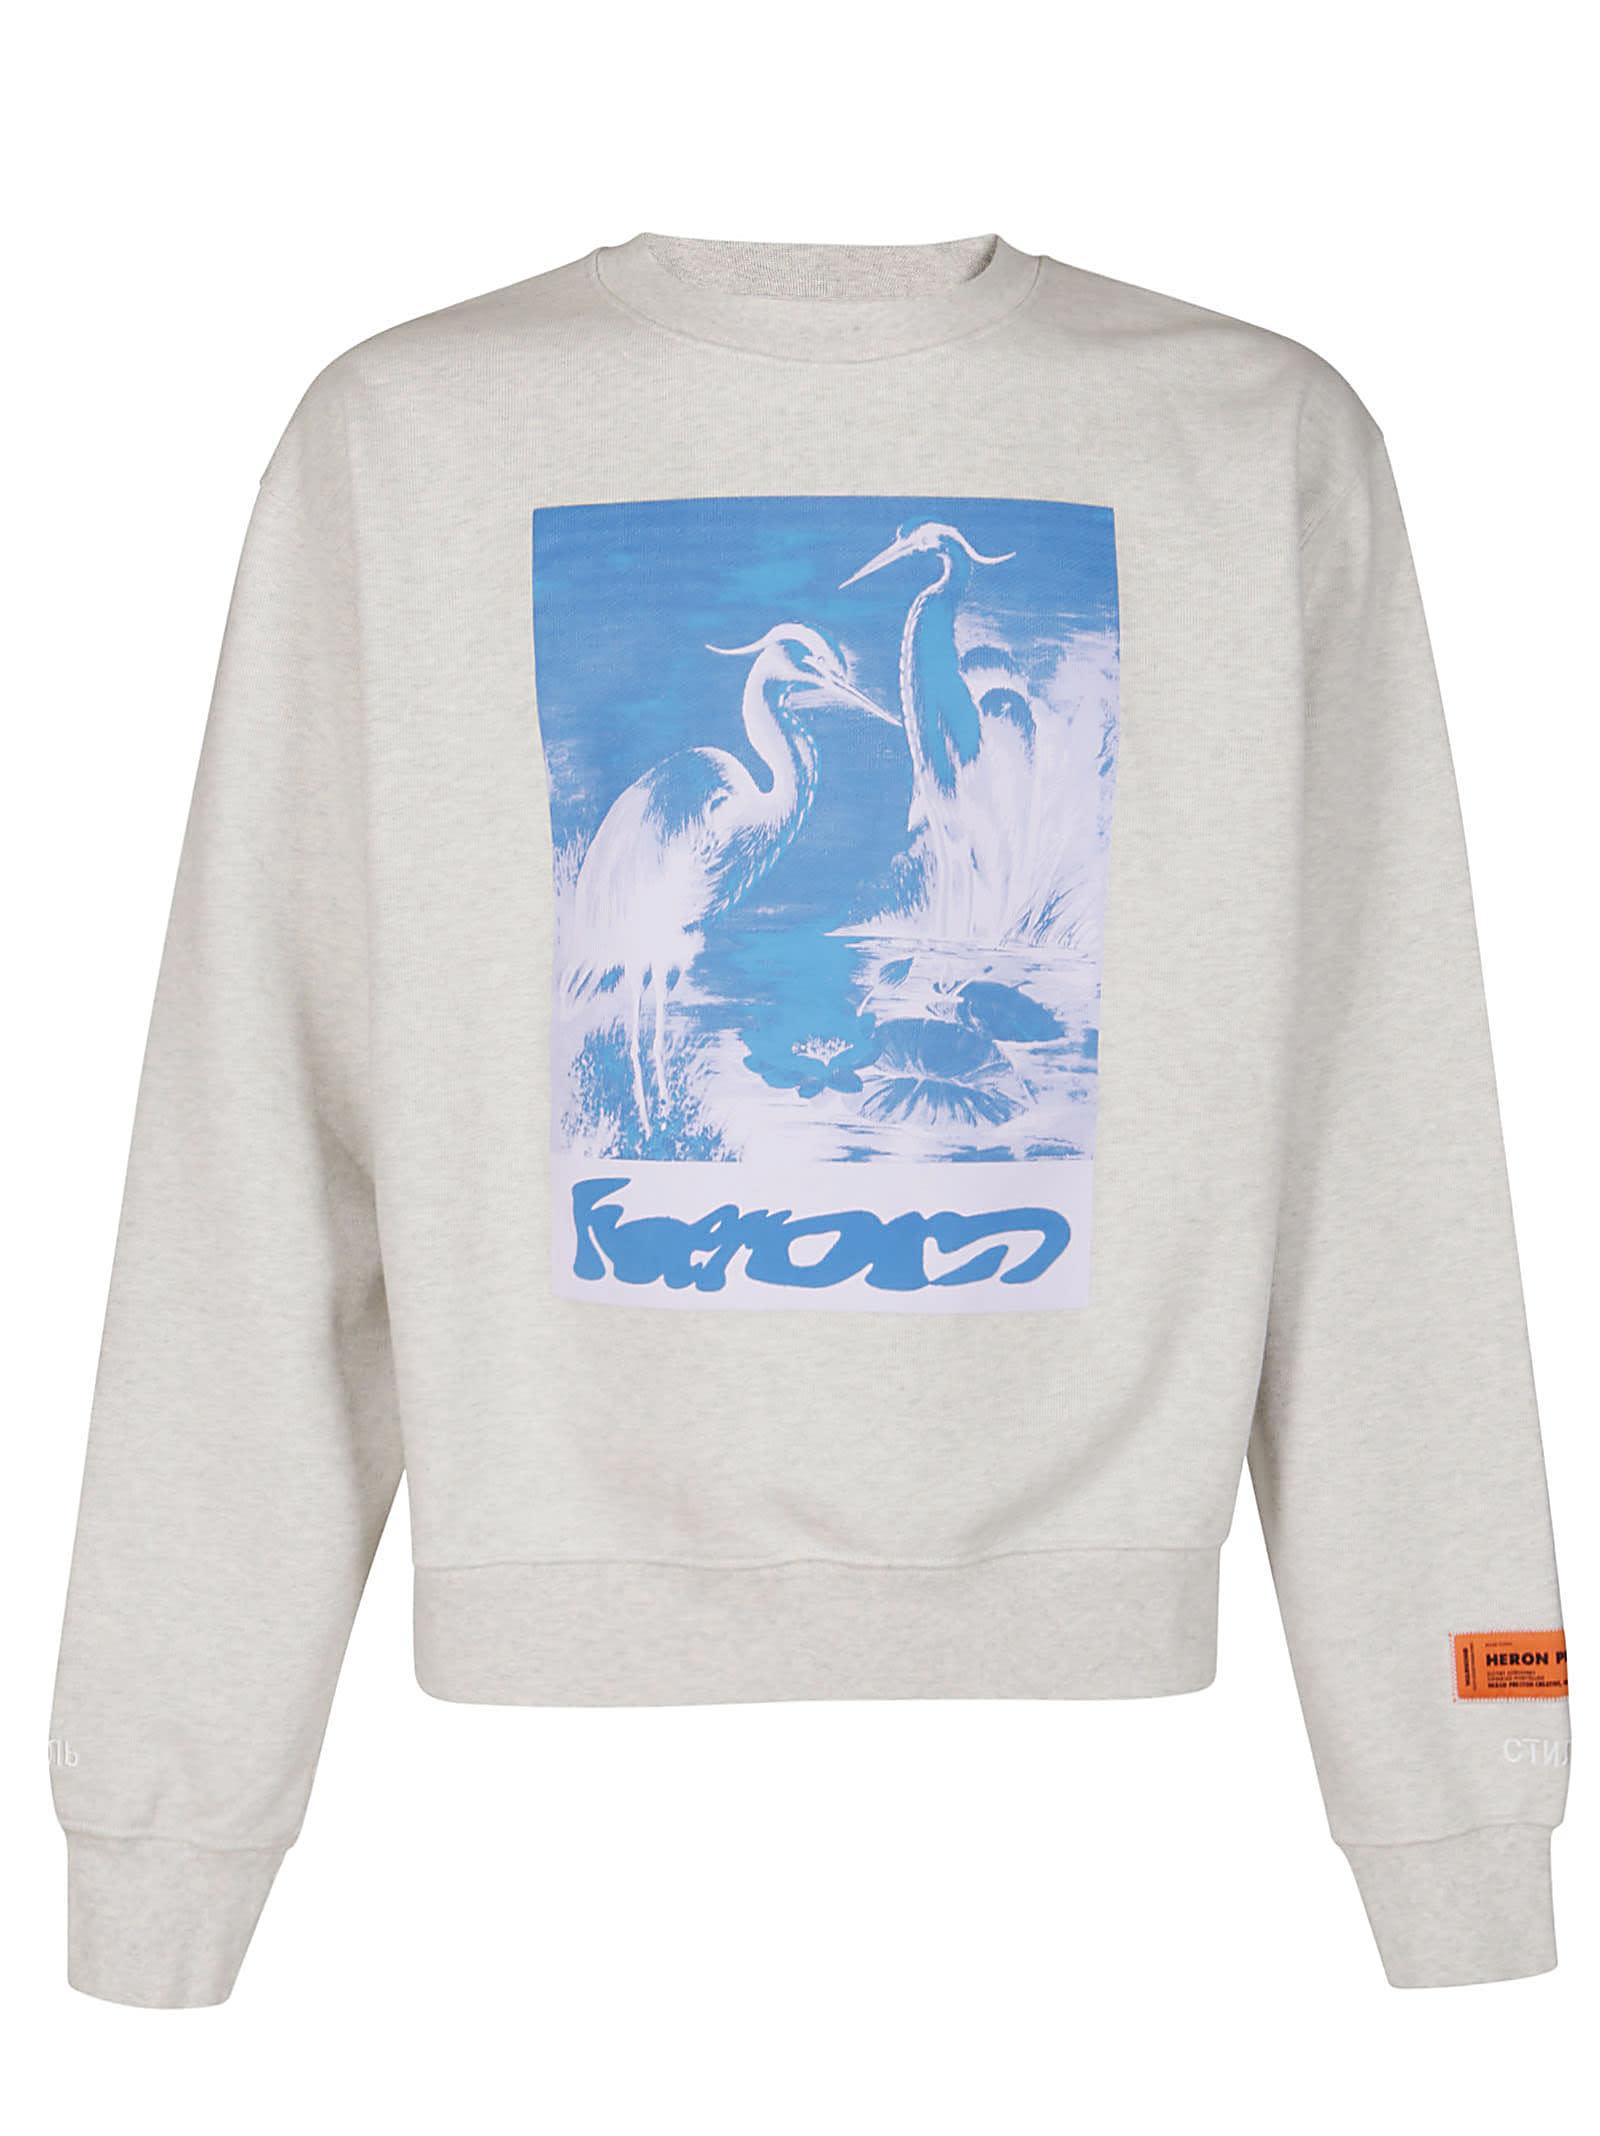 Heron Preston Cottons WHITE COTTON SWEATSHIRT